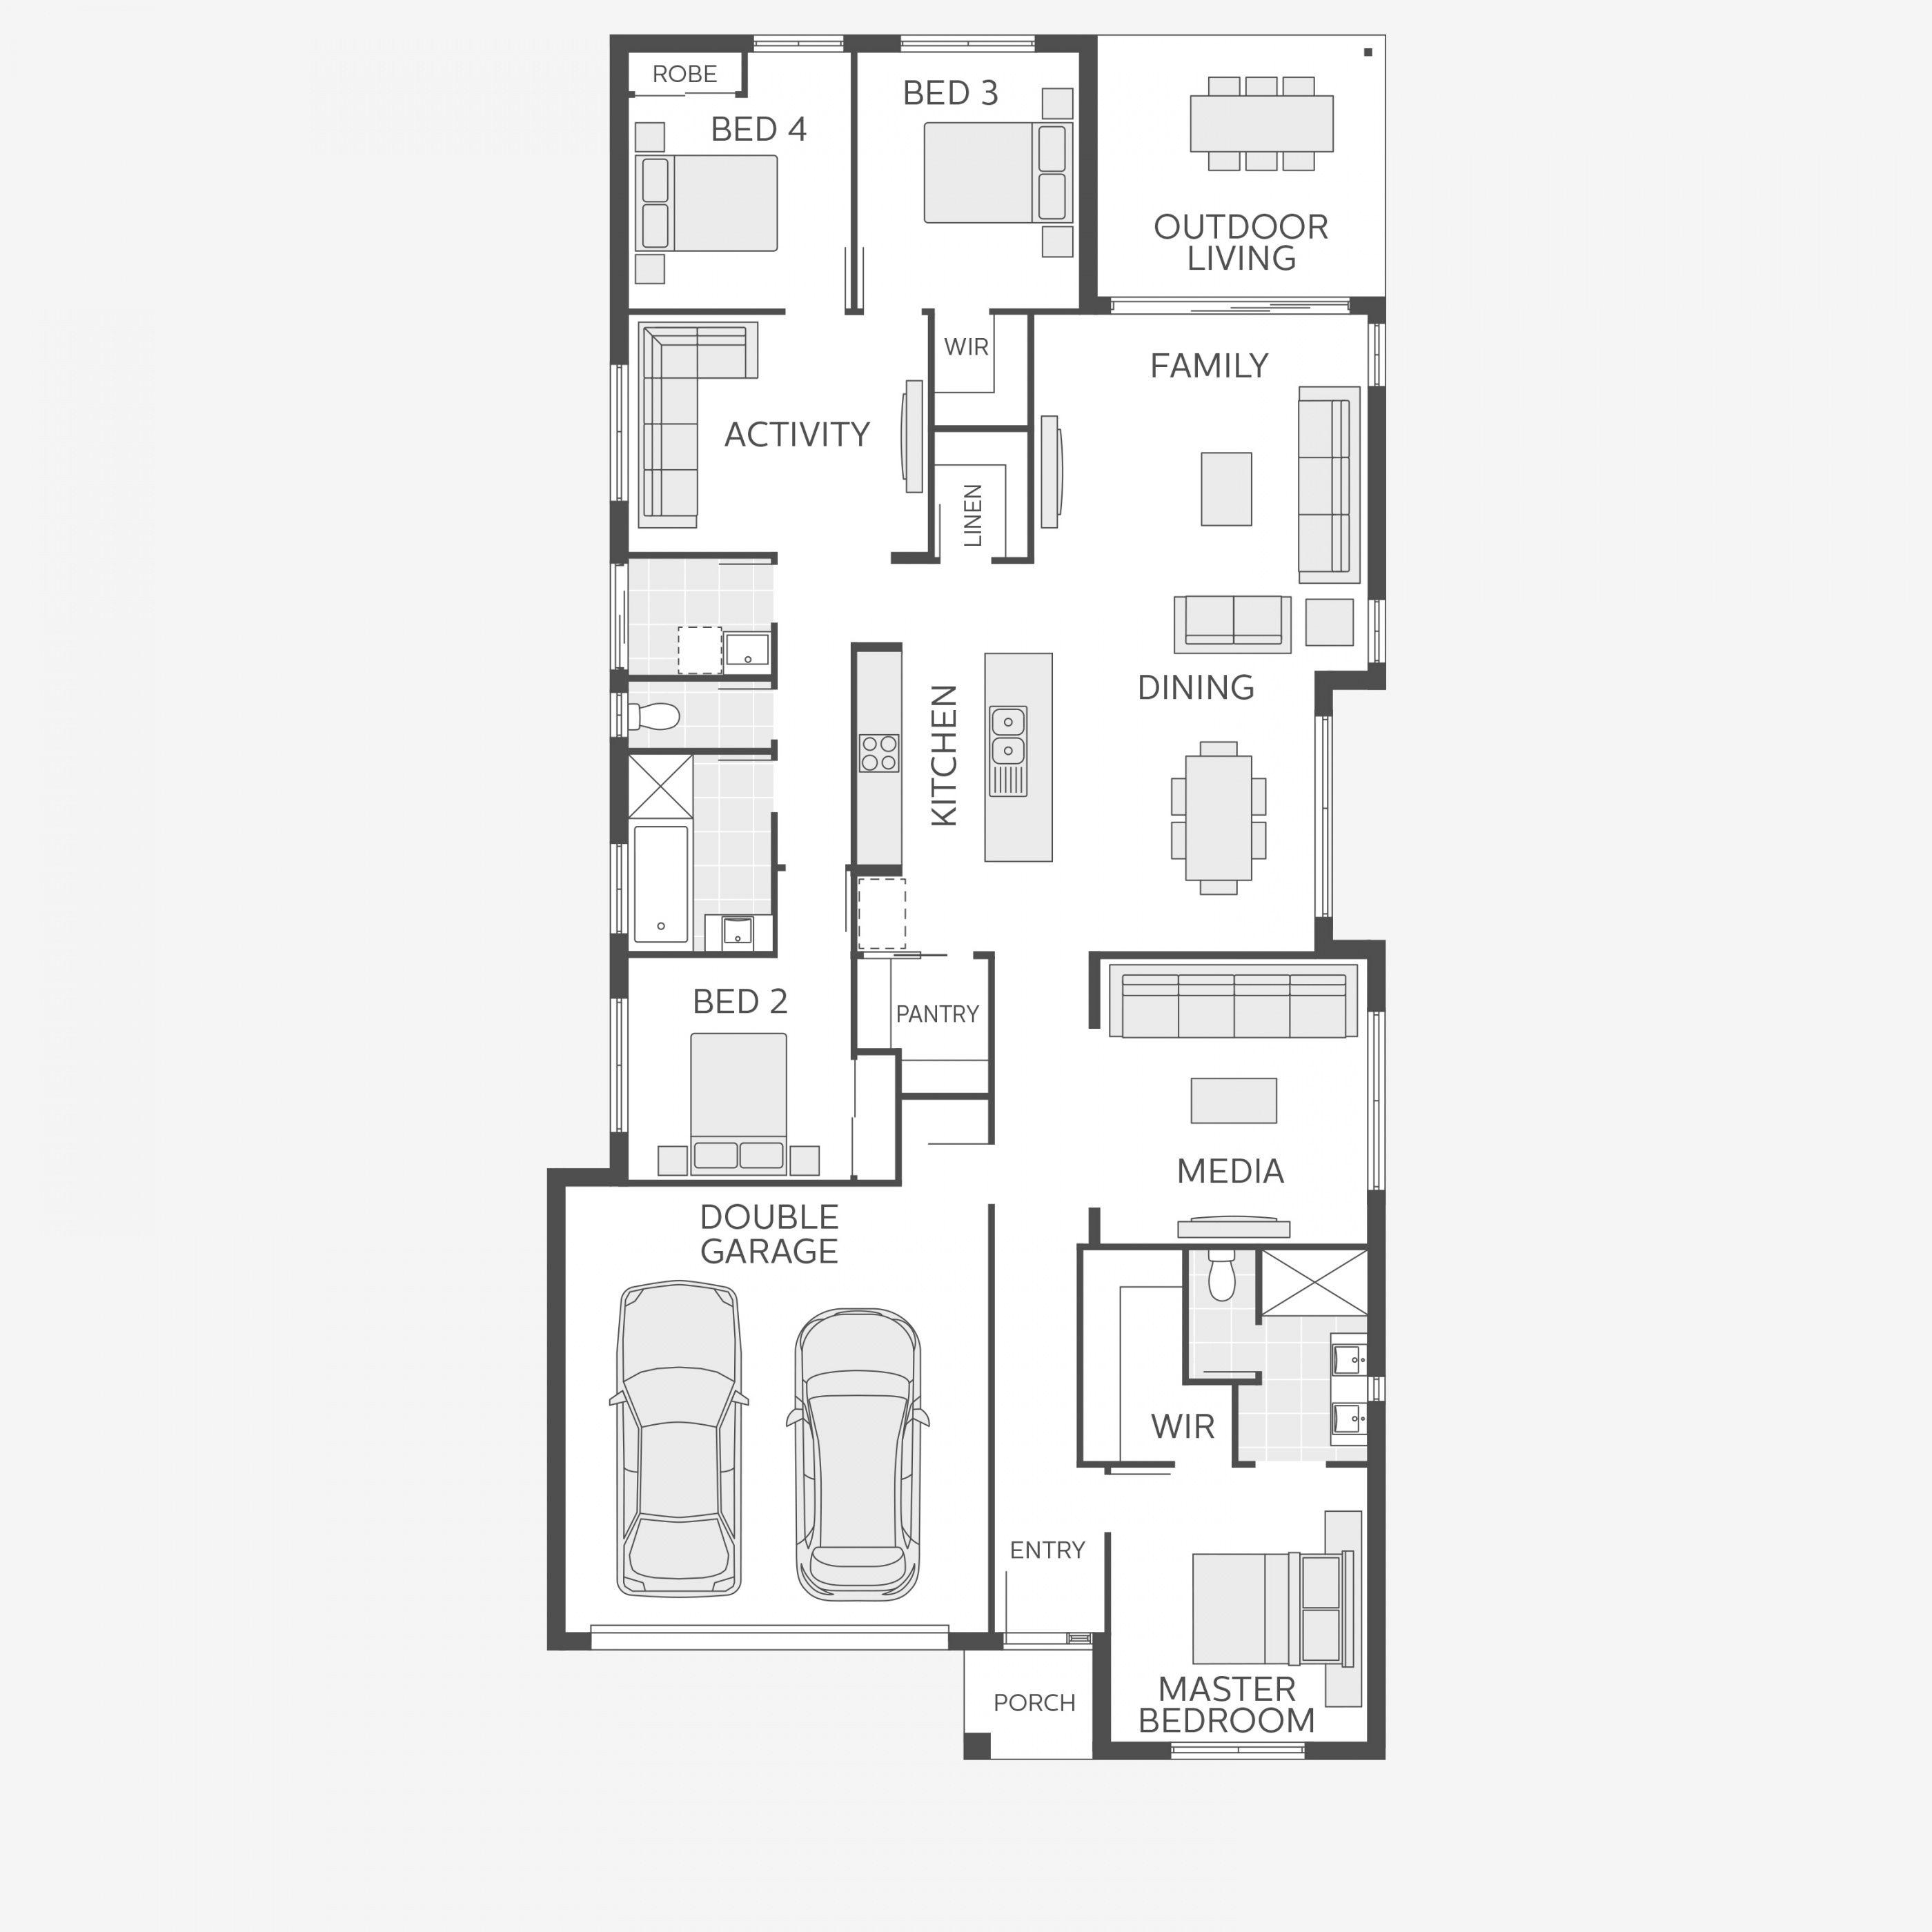 Home Design Floorplan Image Flip Description House Floor Plans Open Plan Living Floor Plans